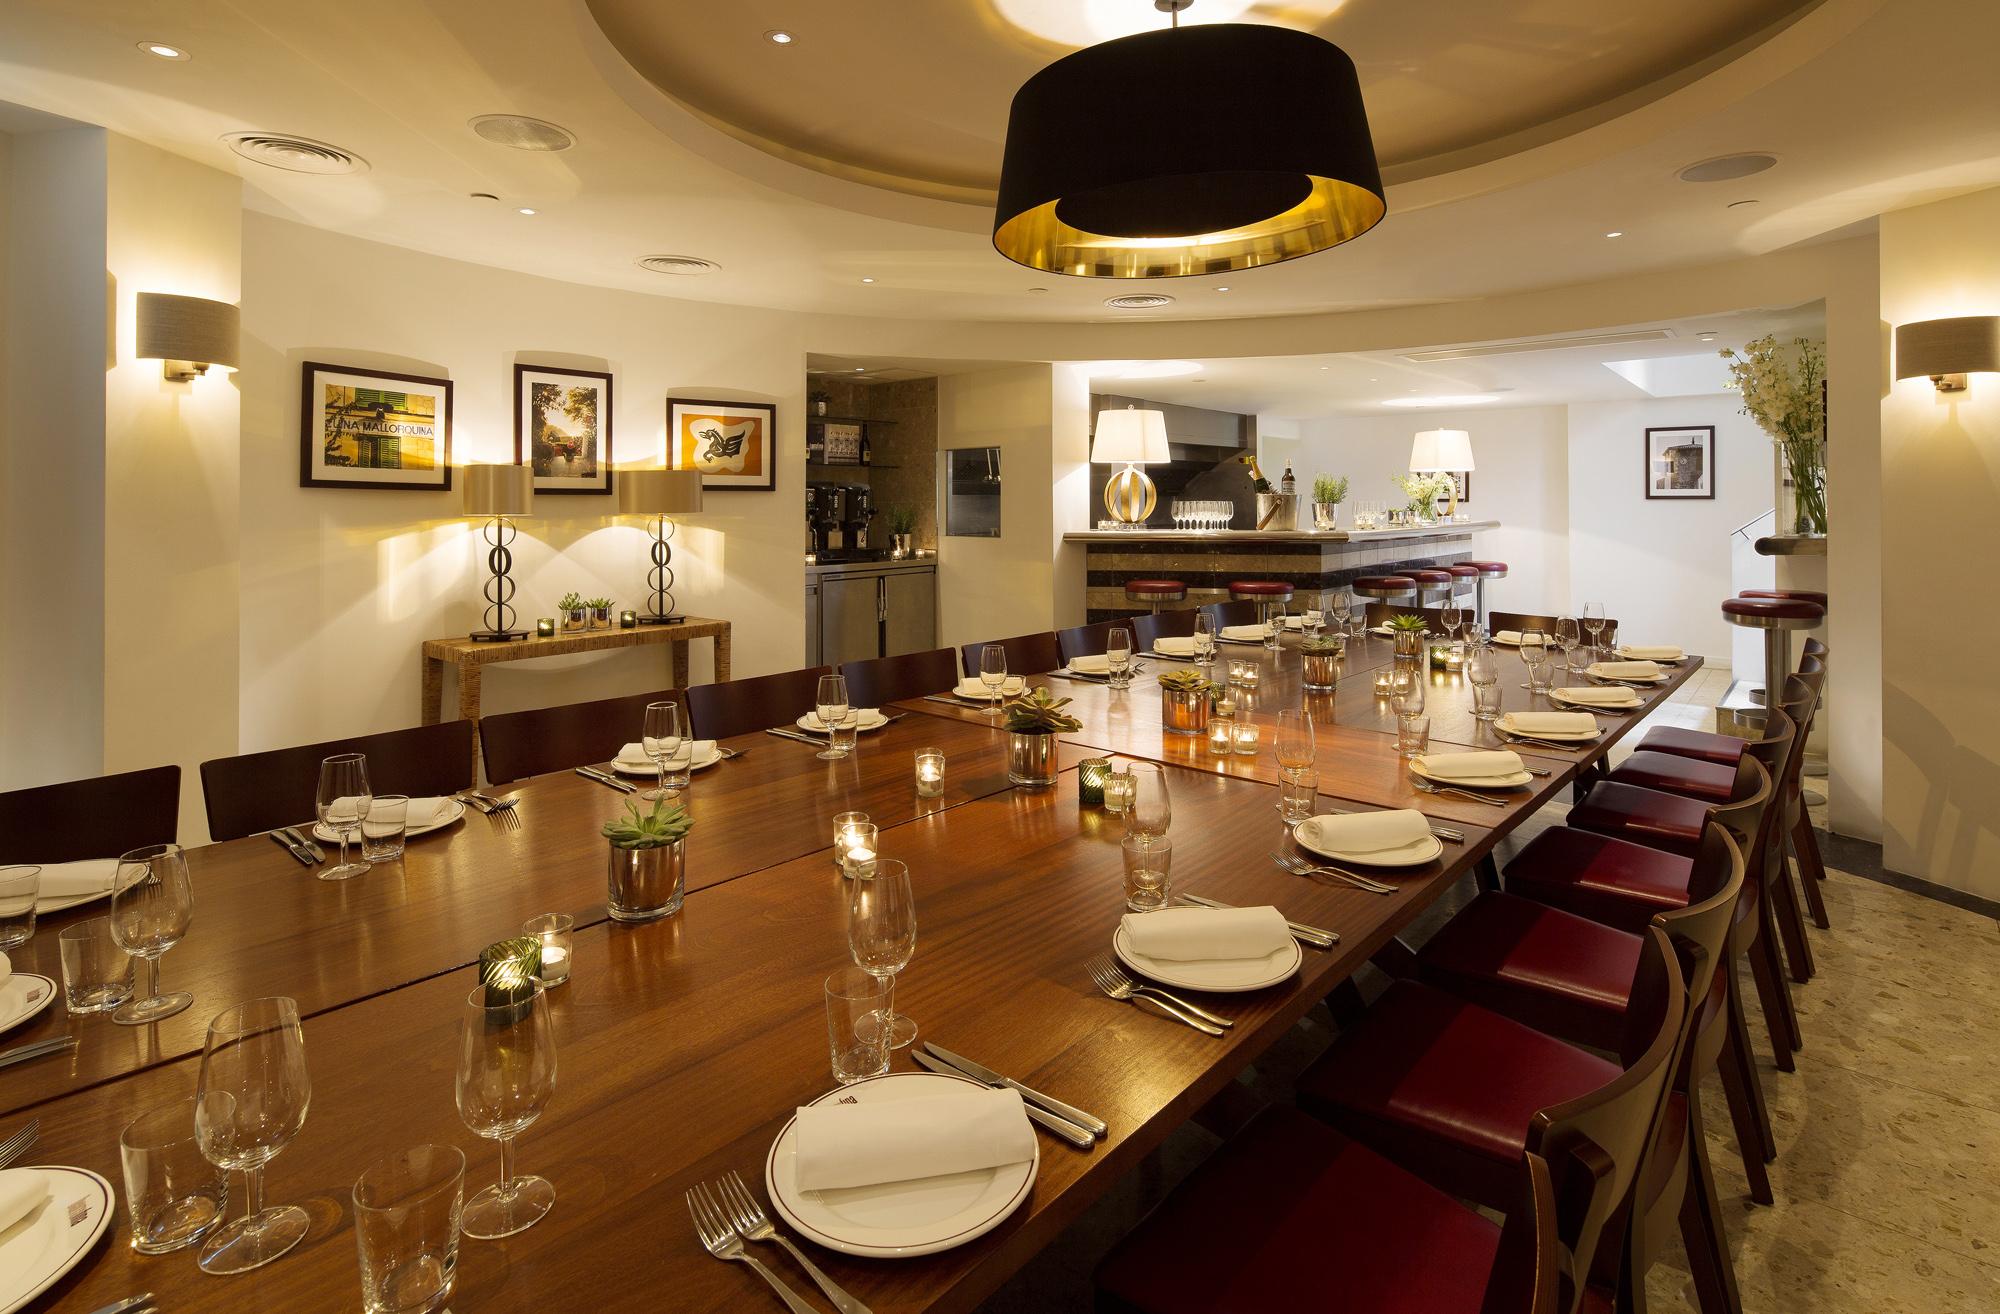 Alternative Christmas dinners barrafina adelaide street london restaurants